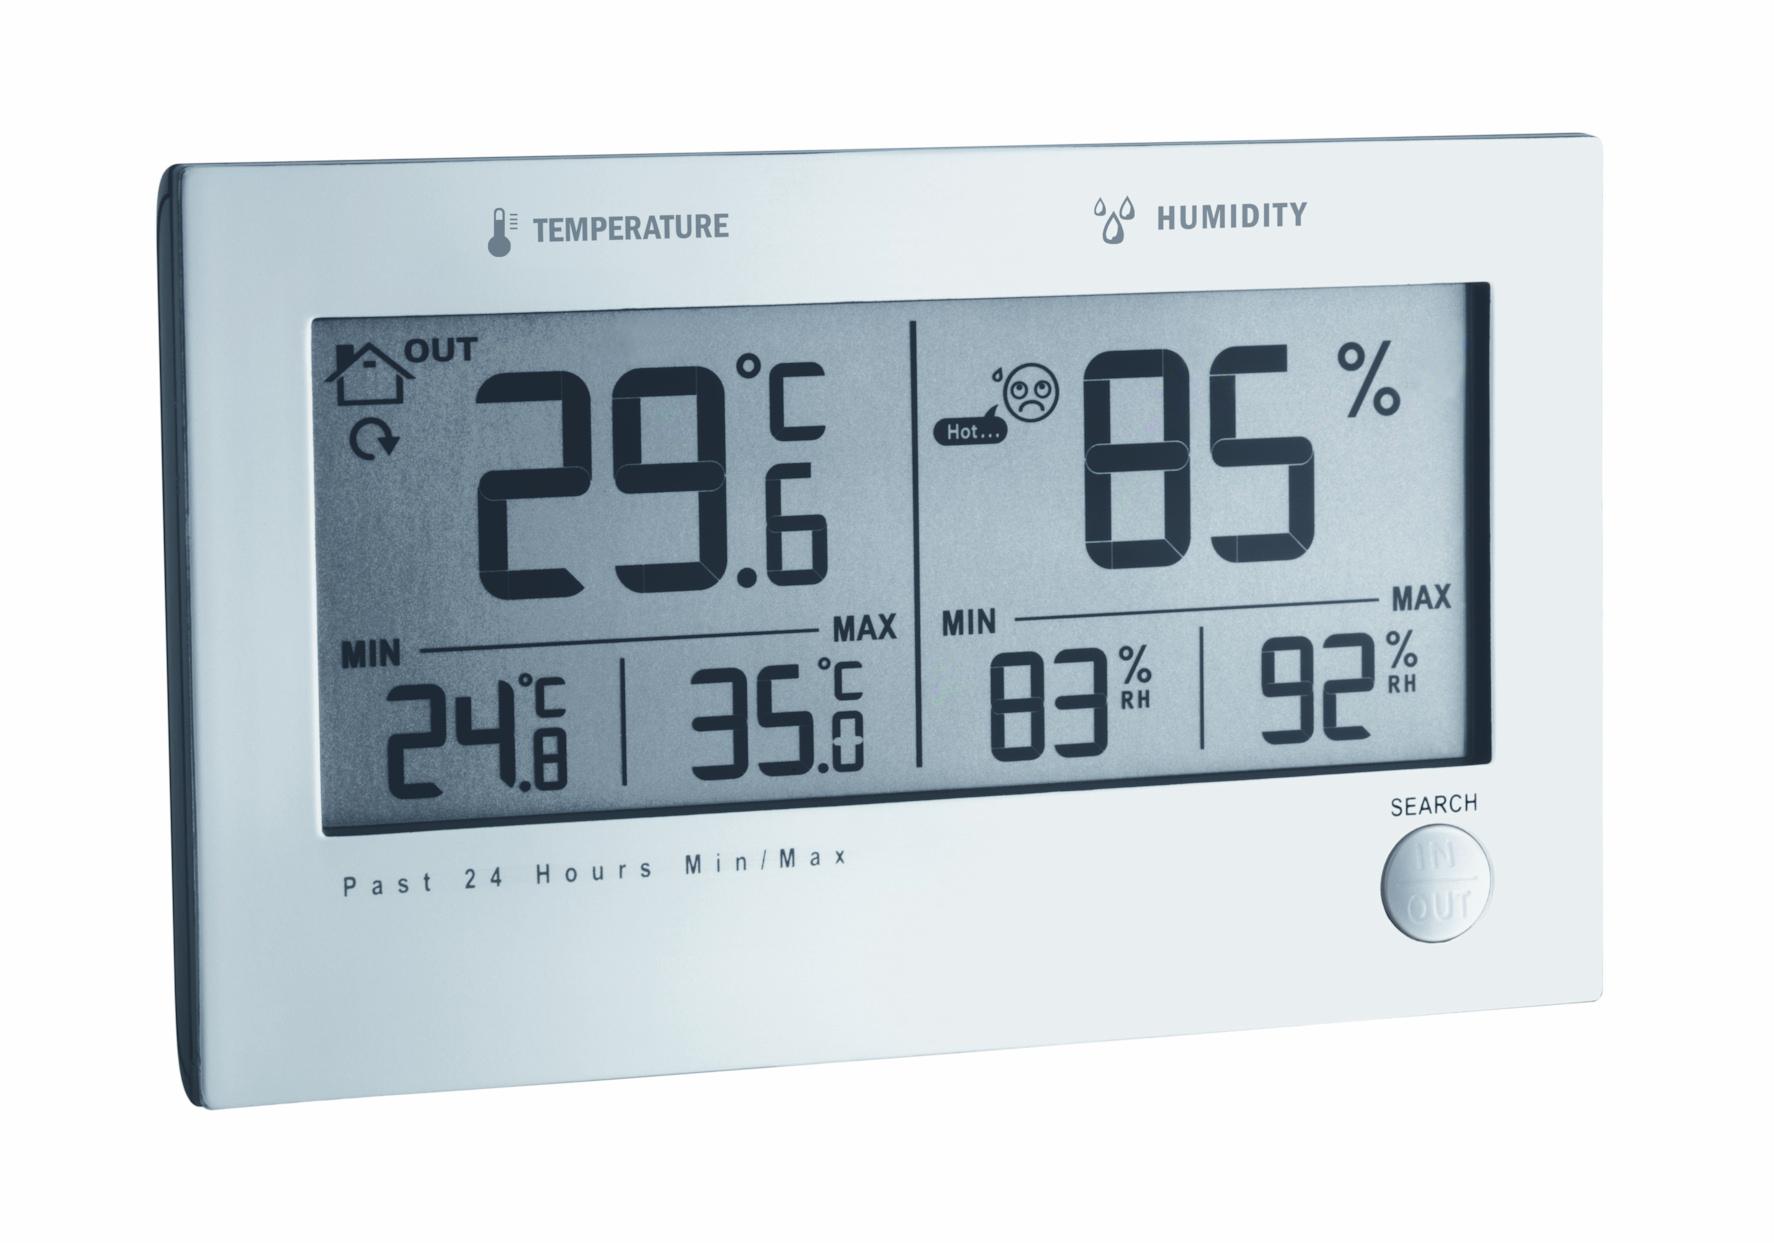 Kühlschrank Thermometer Funk : Westmark bratenthermometer digital edelstahl otto